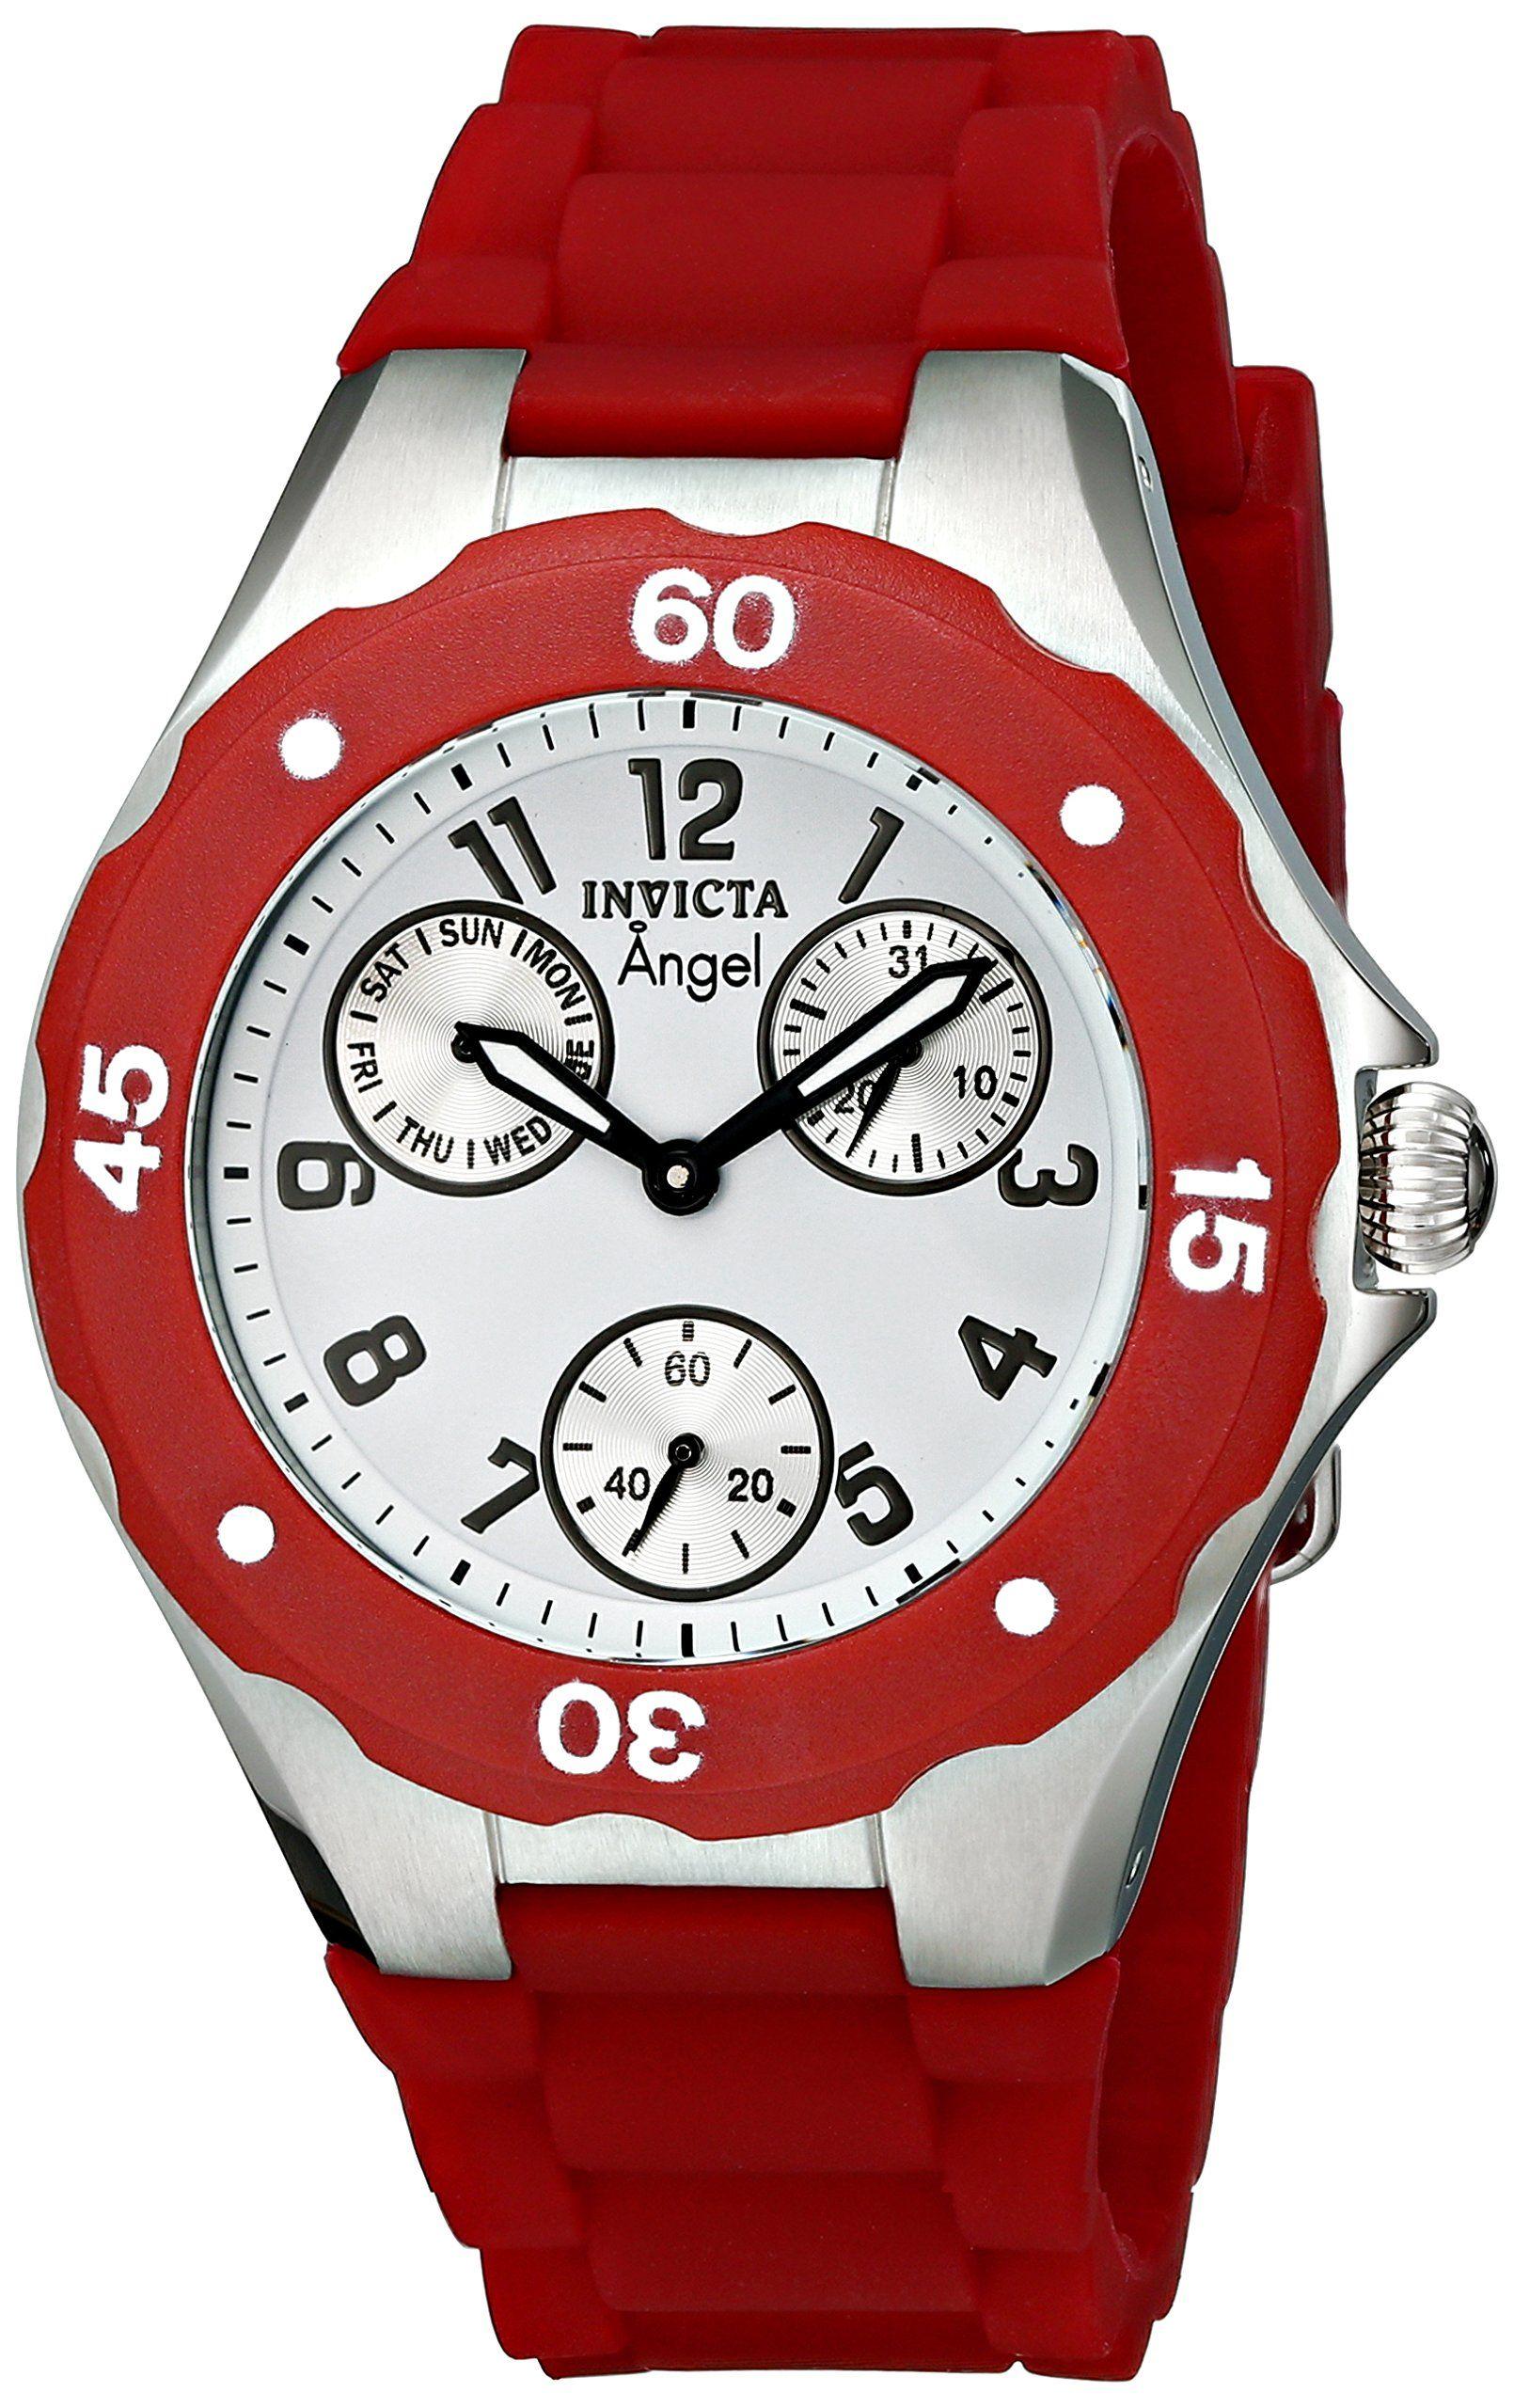 owned cronografo pre officine womens watches chronograph panerai ferrari